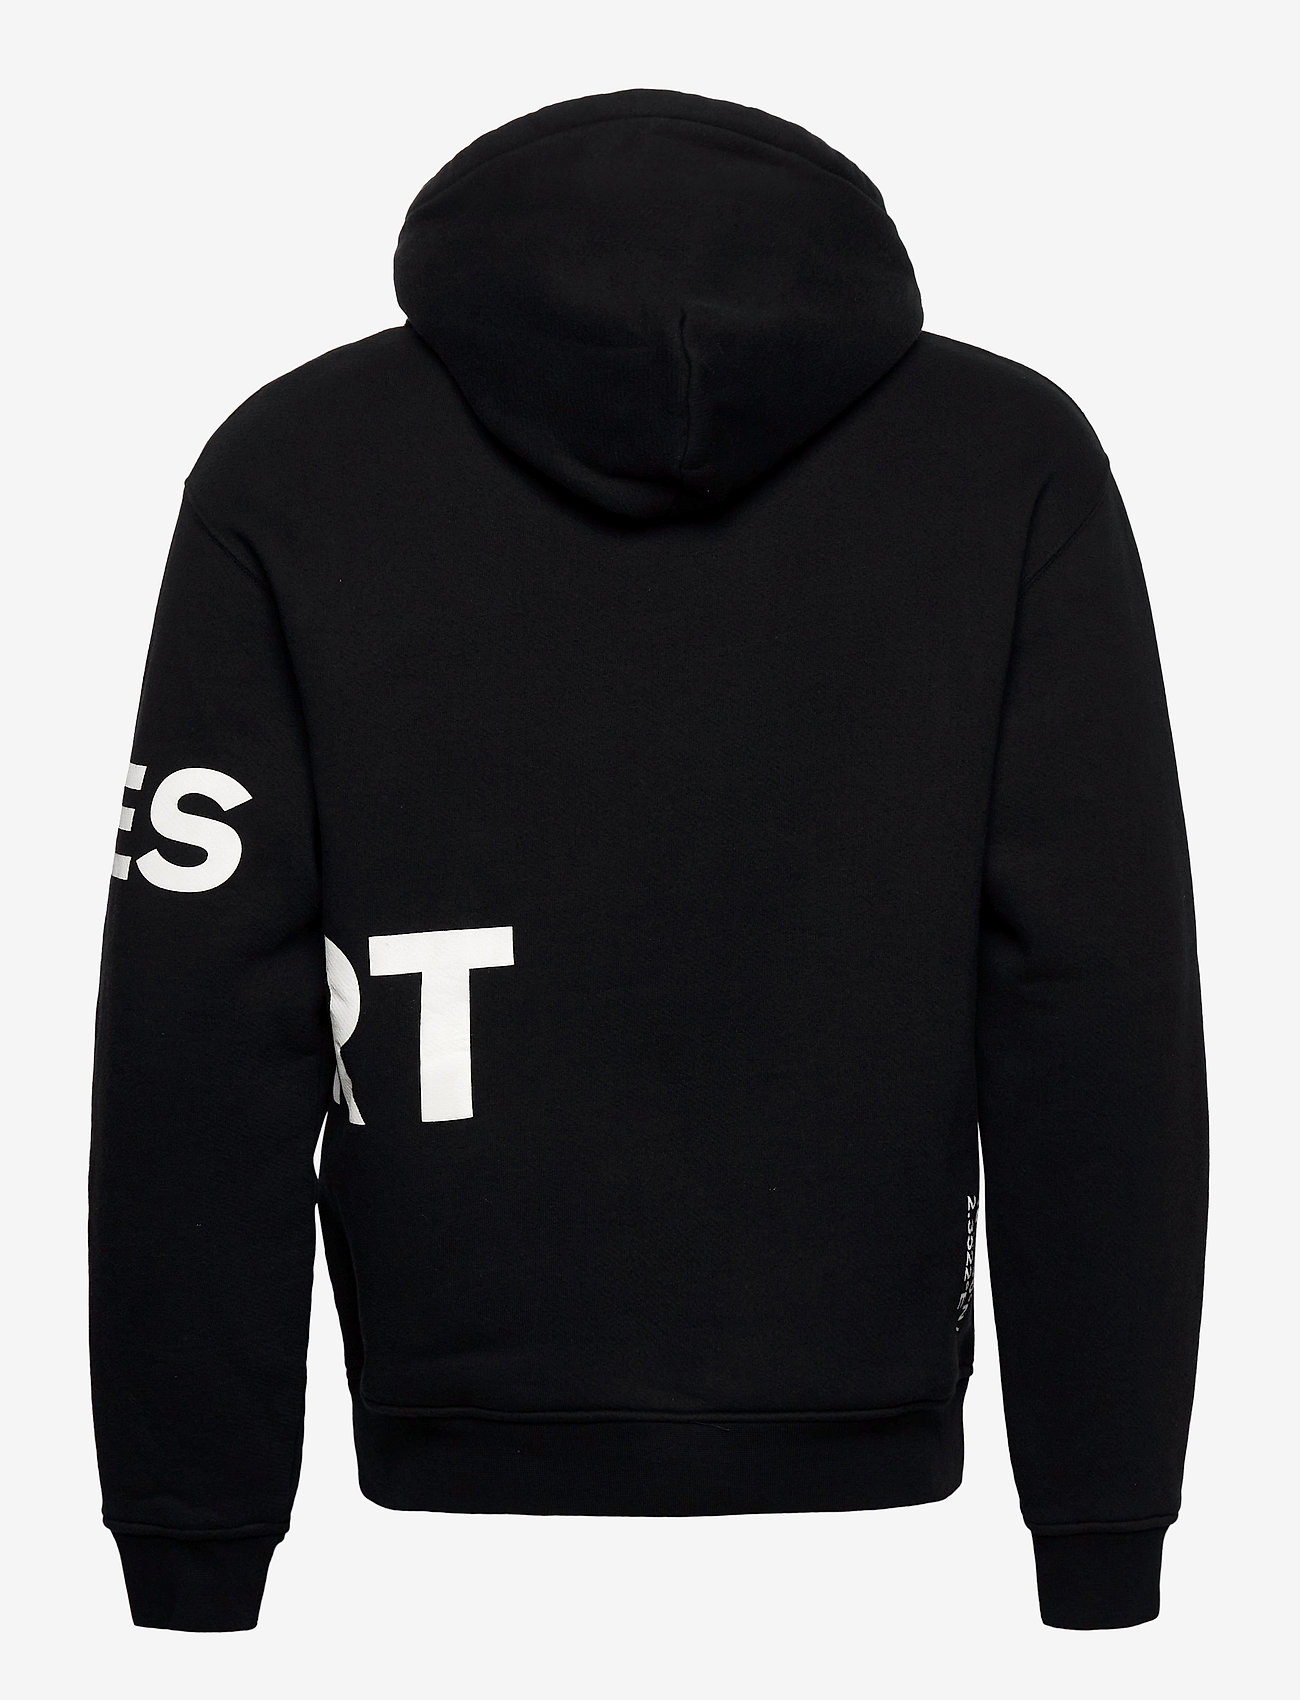 The Kooples SWEAT - Sweatshirts BLACK - Menn Klær